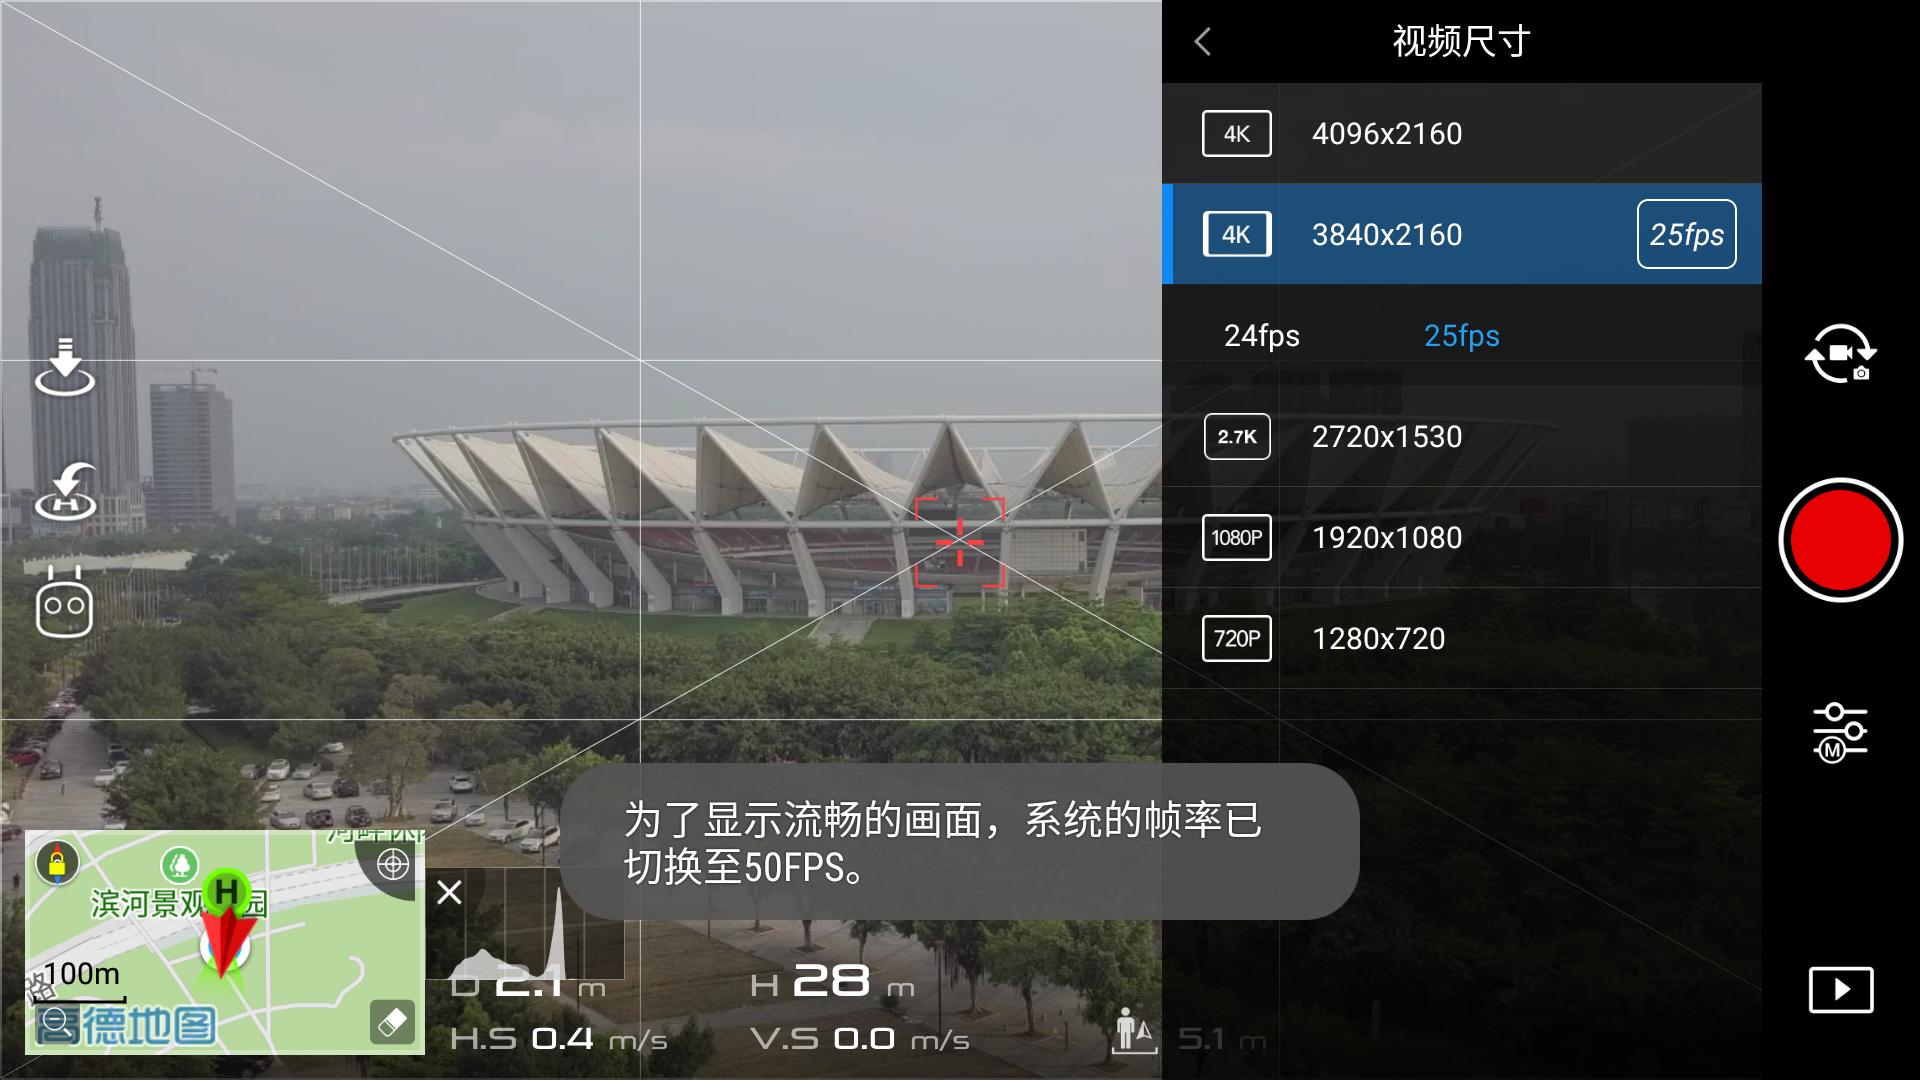 Screenshot_2018-05-28-16-55-53.png